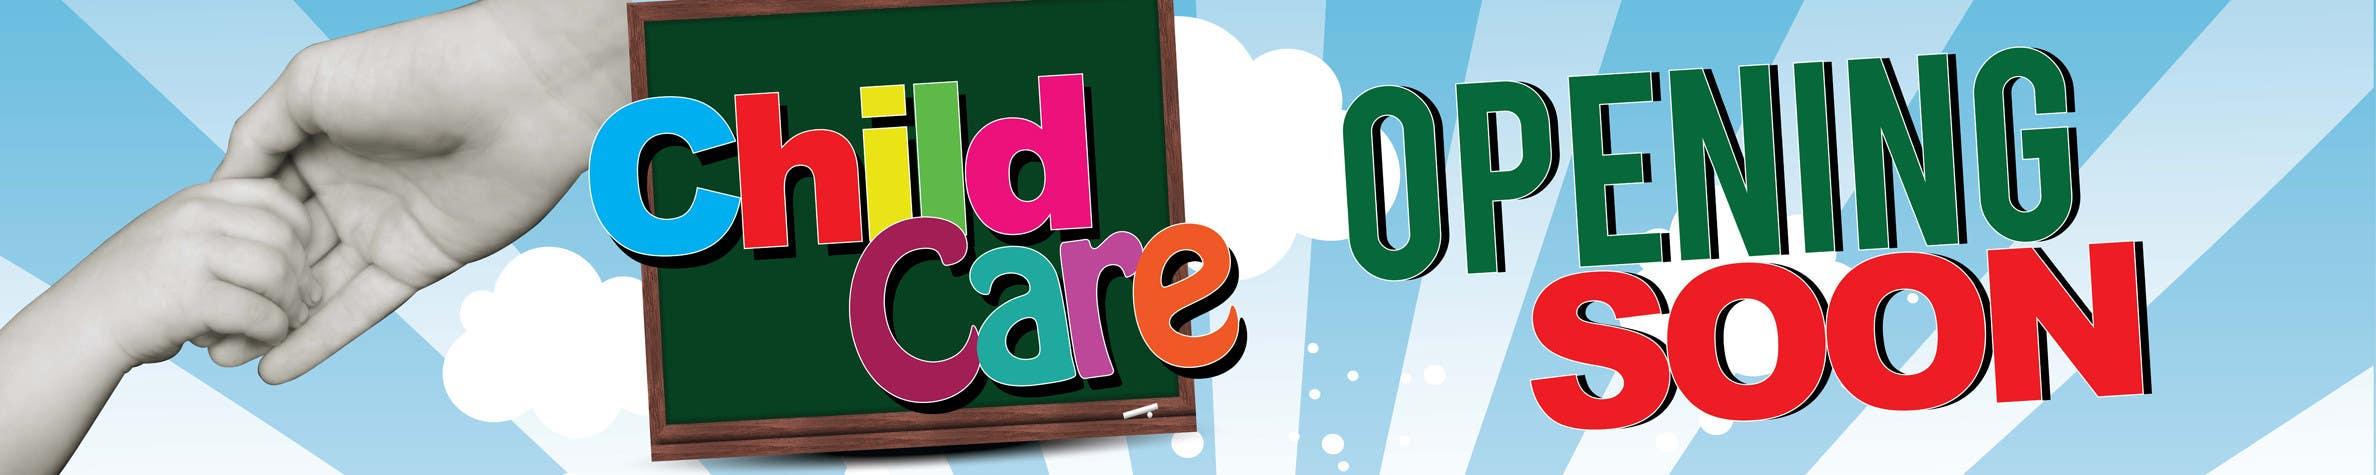 Bài tham dự cuộc thi #22 cho Design a Banner for Child Care Centre